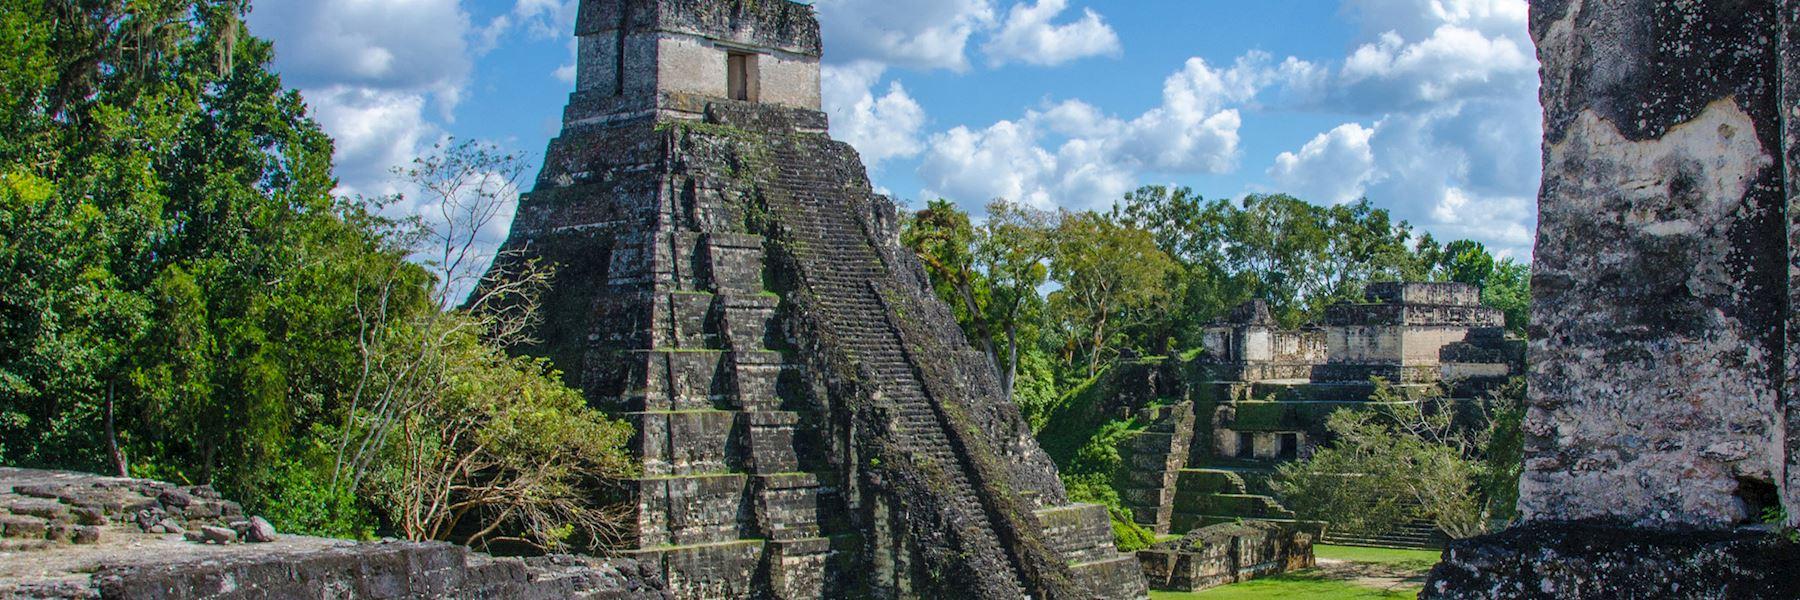 Belize travel advice